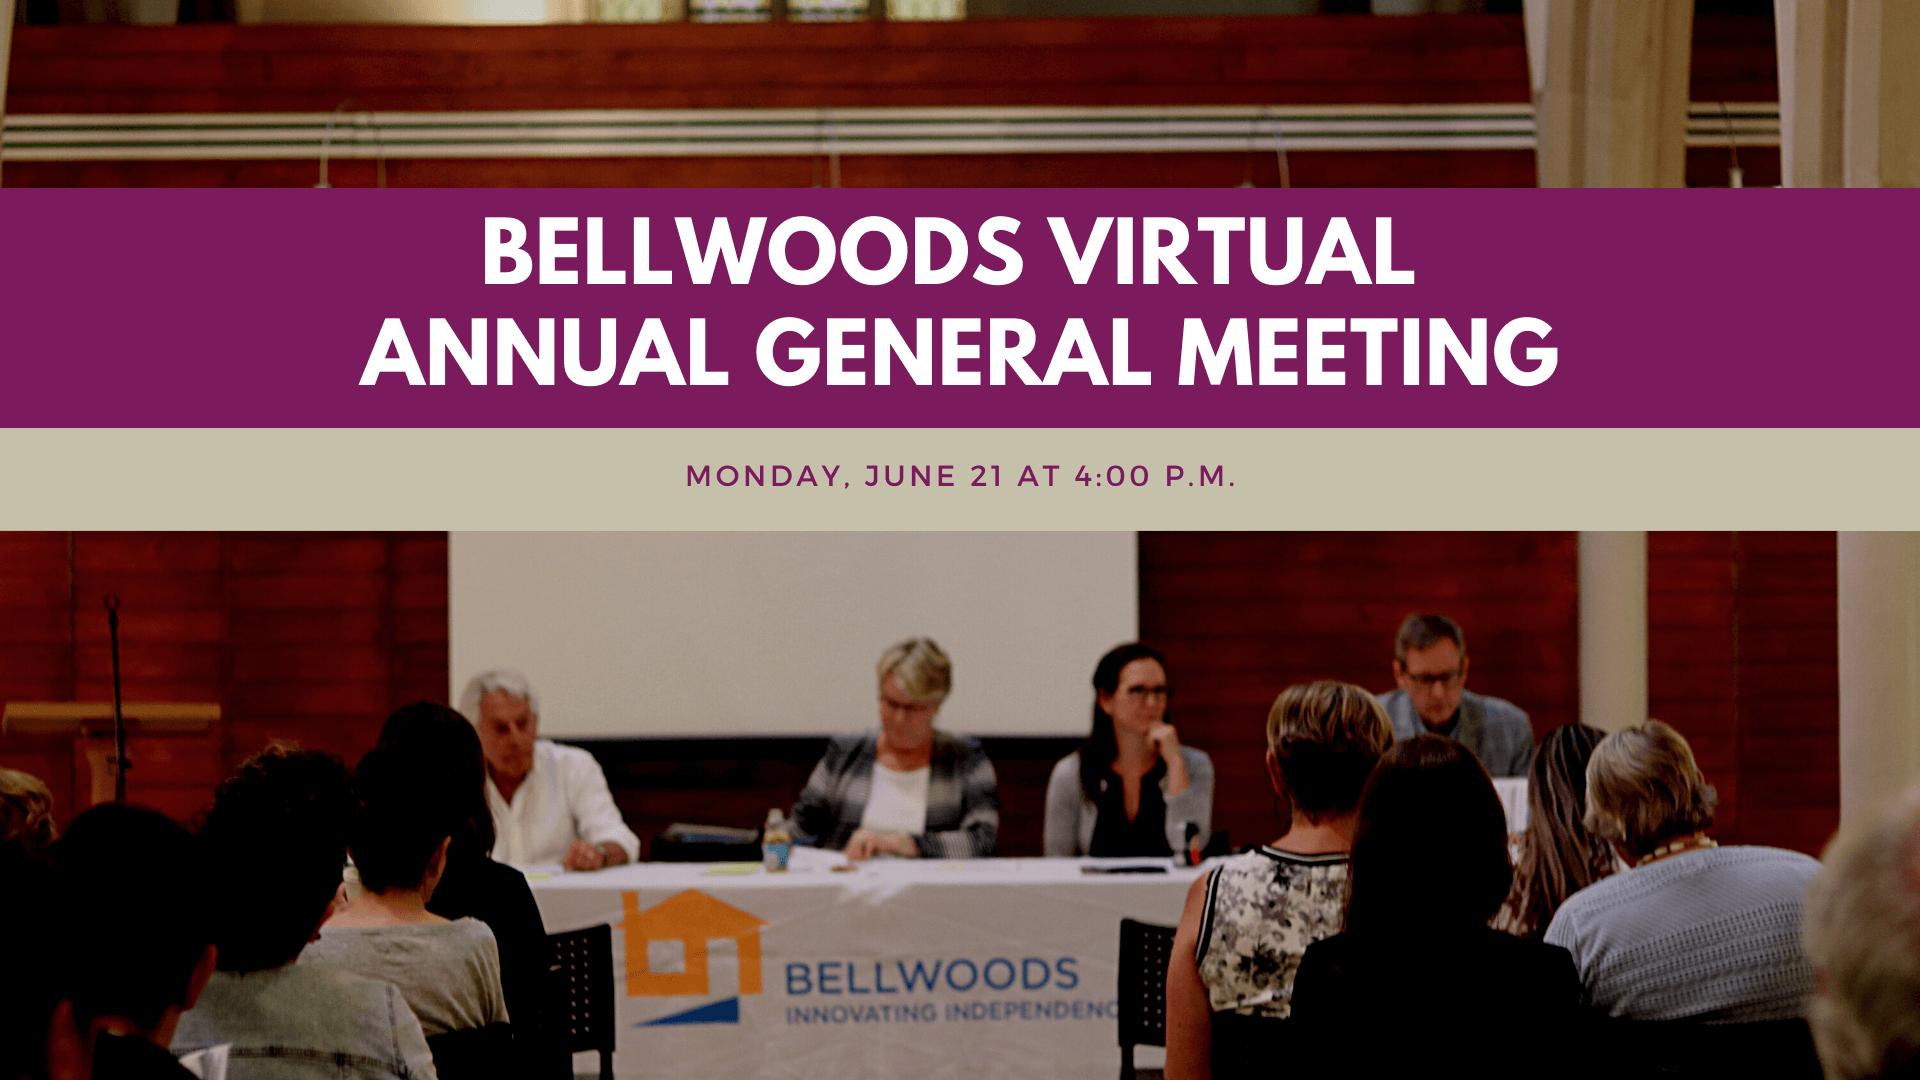 Bellwoods' 2021 Virtual Annual General Meeting